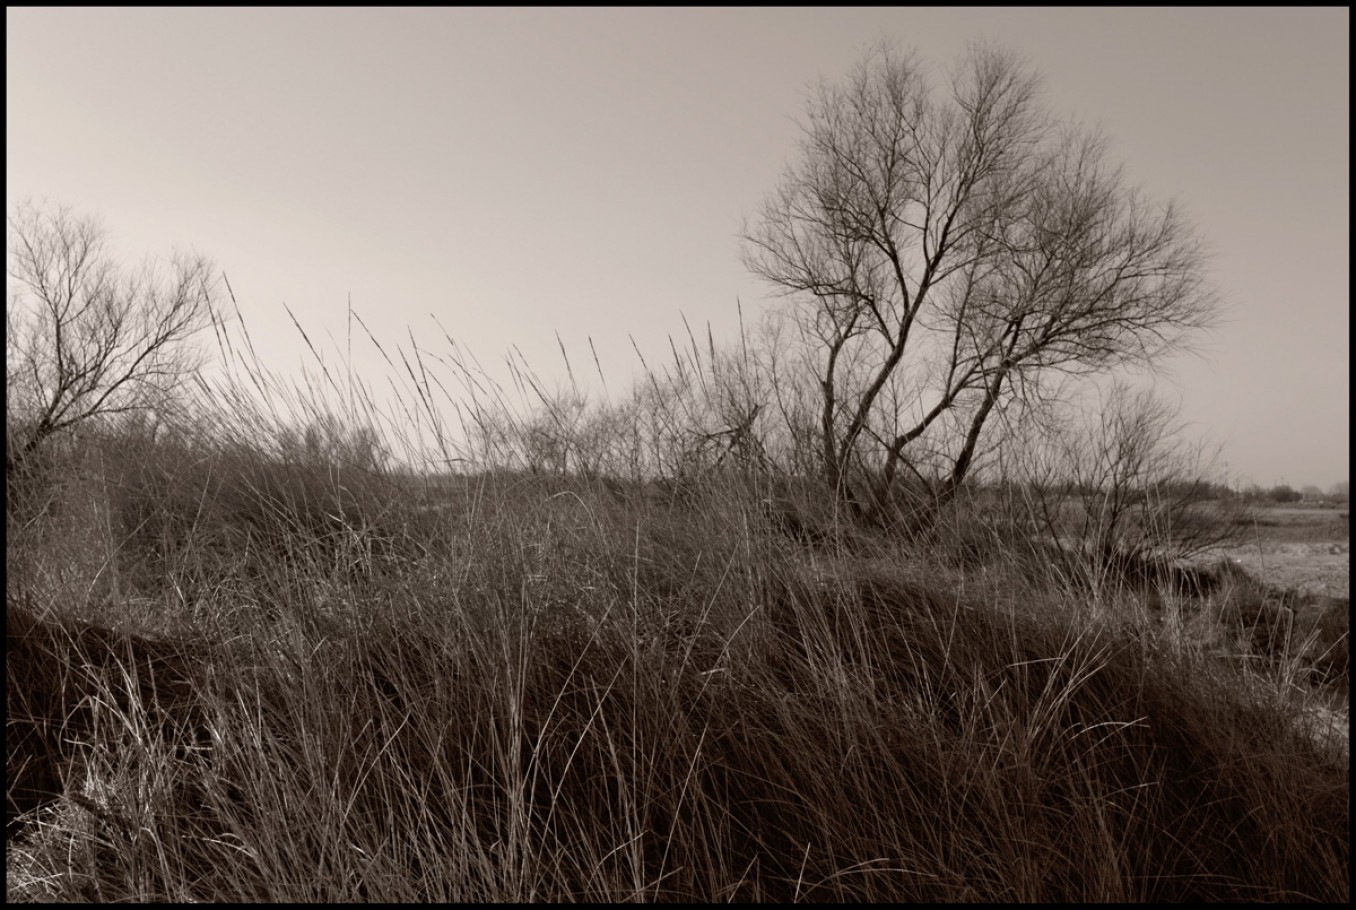 26 gennaio 2014, dune a Lido di Dante